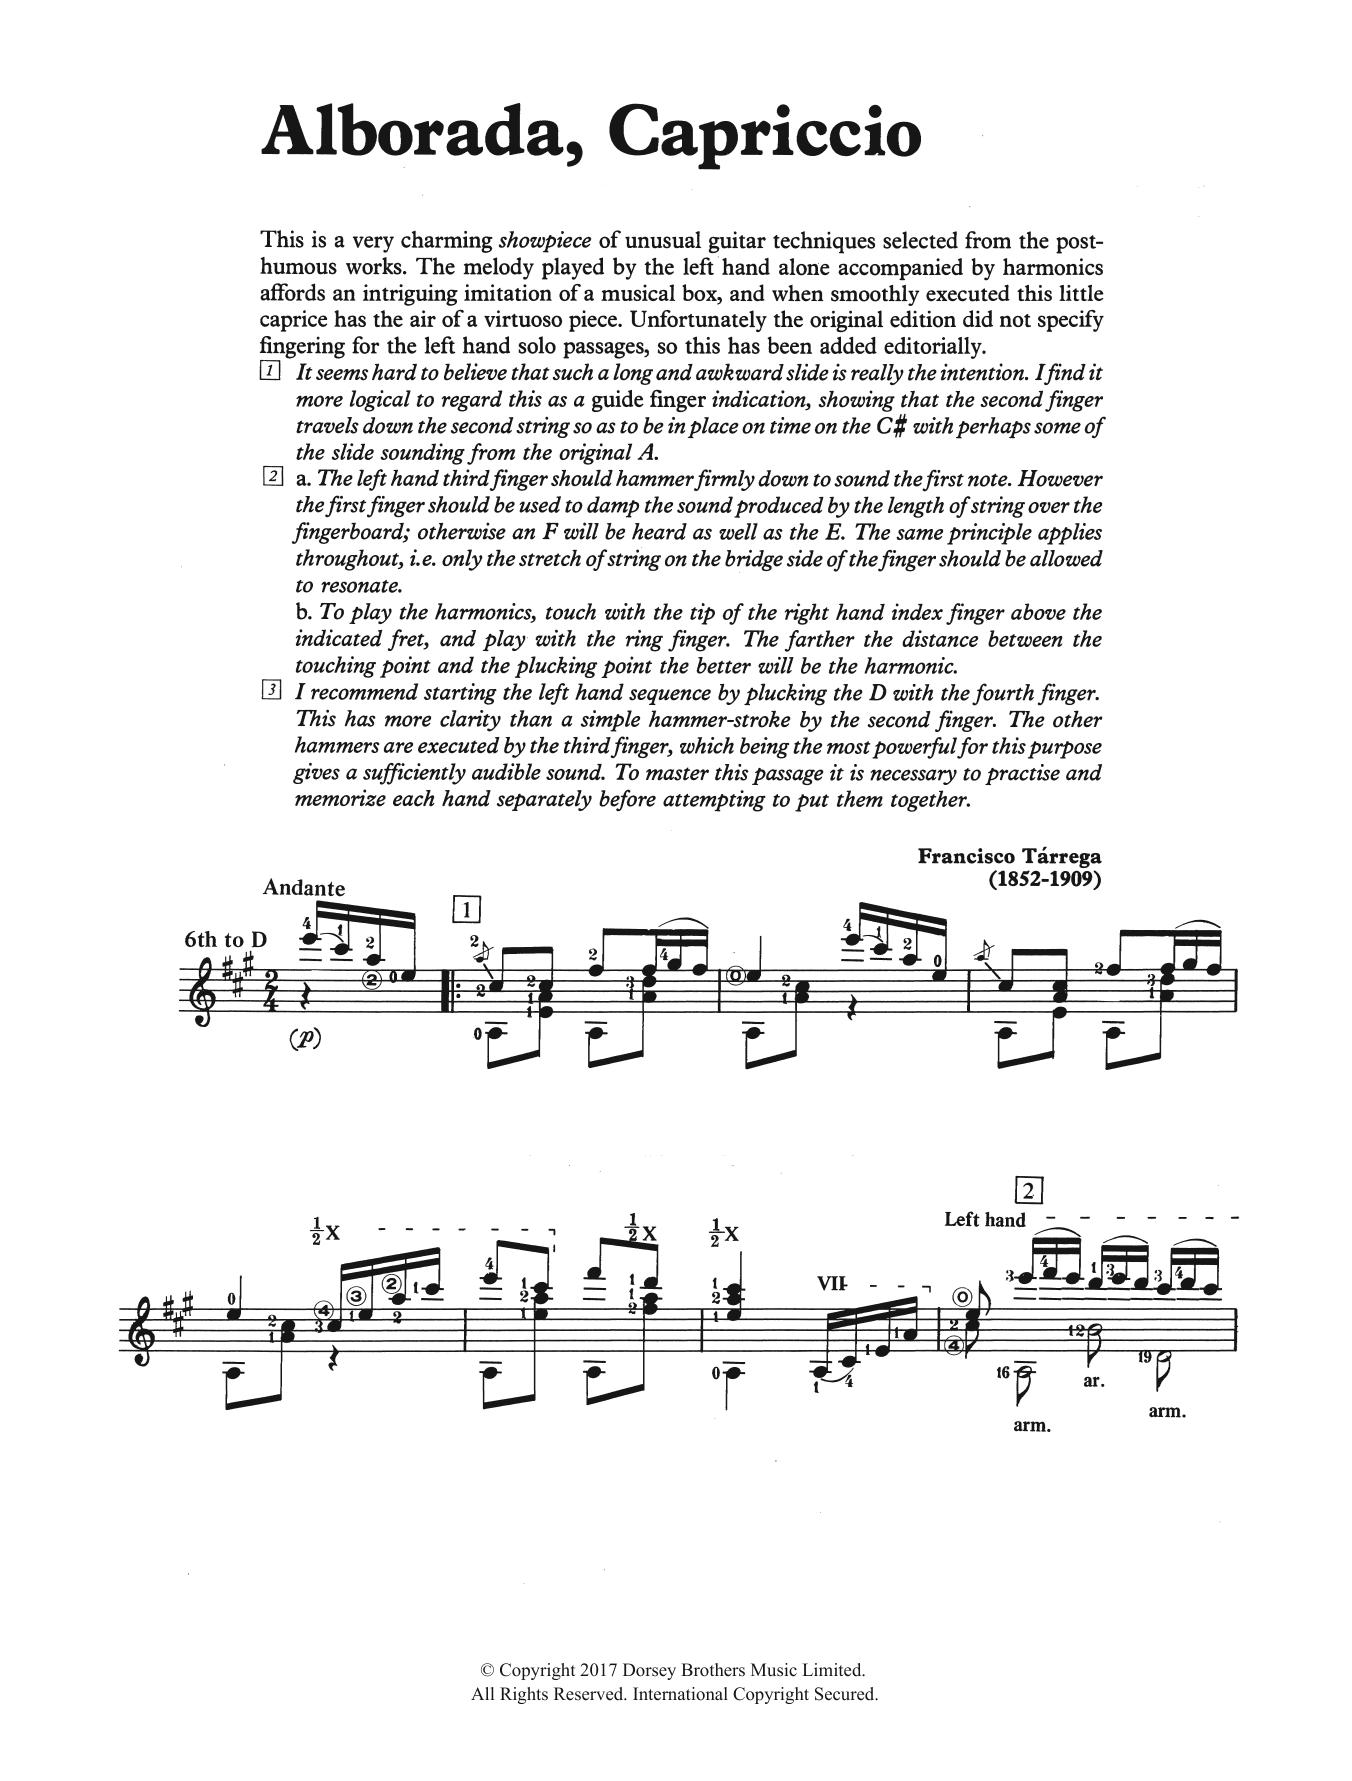 Francisco Tarrega Alborada, Capriccio sheet music notes and chords. Download Printable PDF.